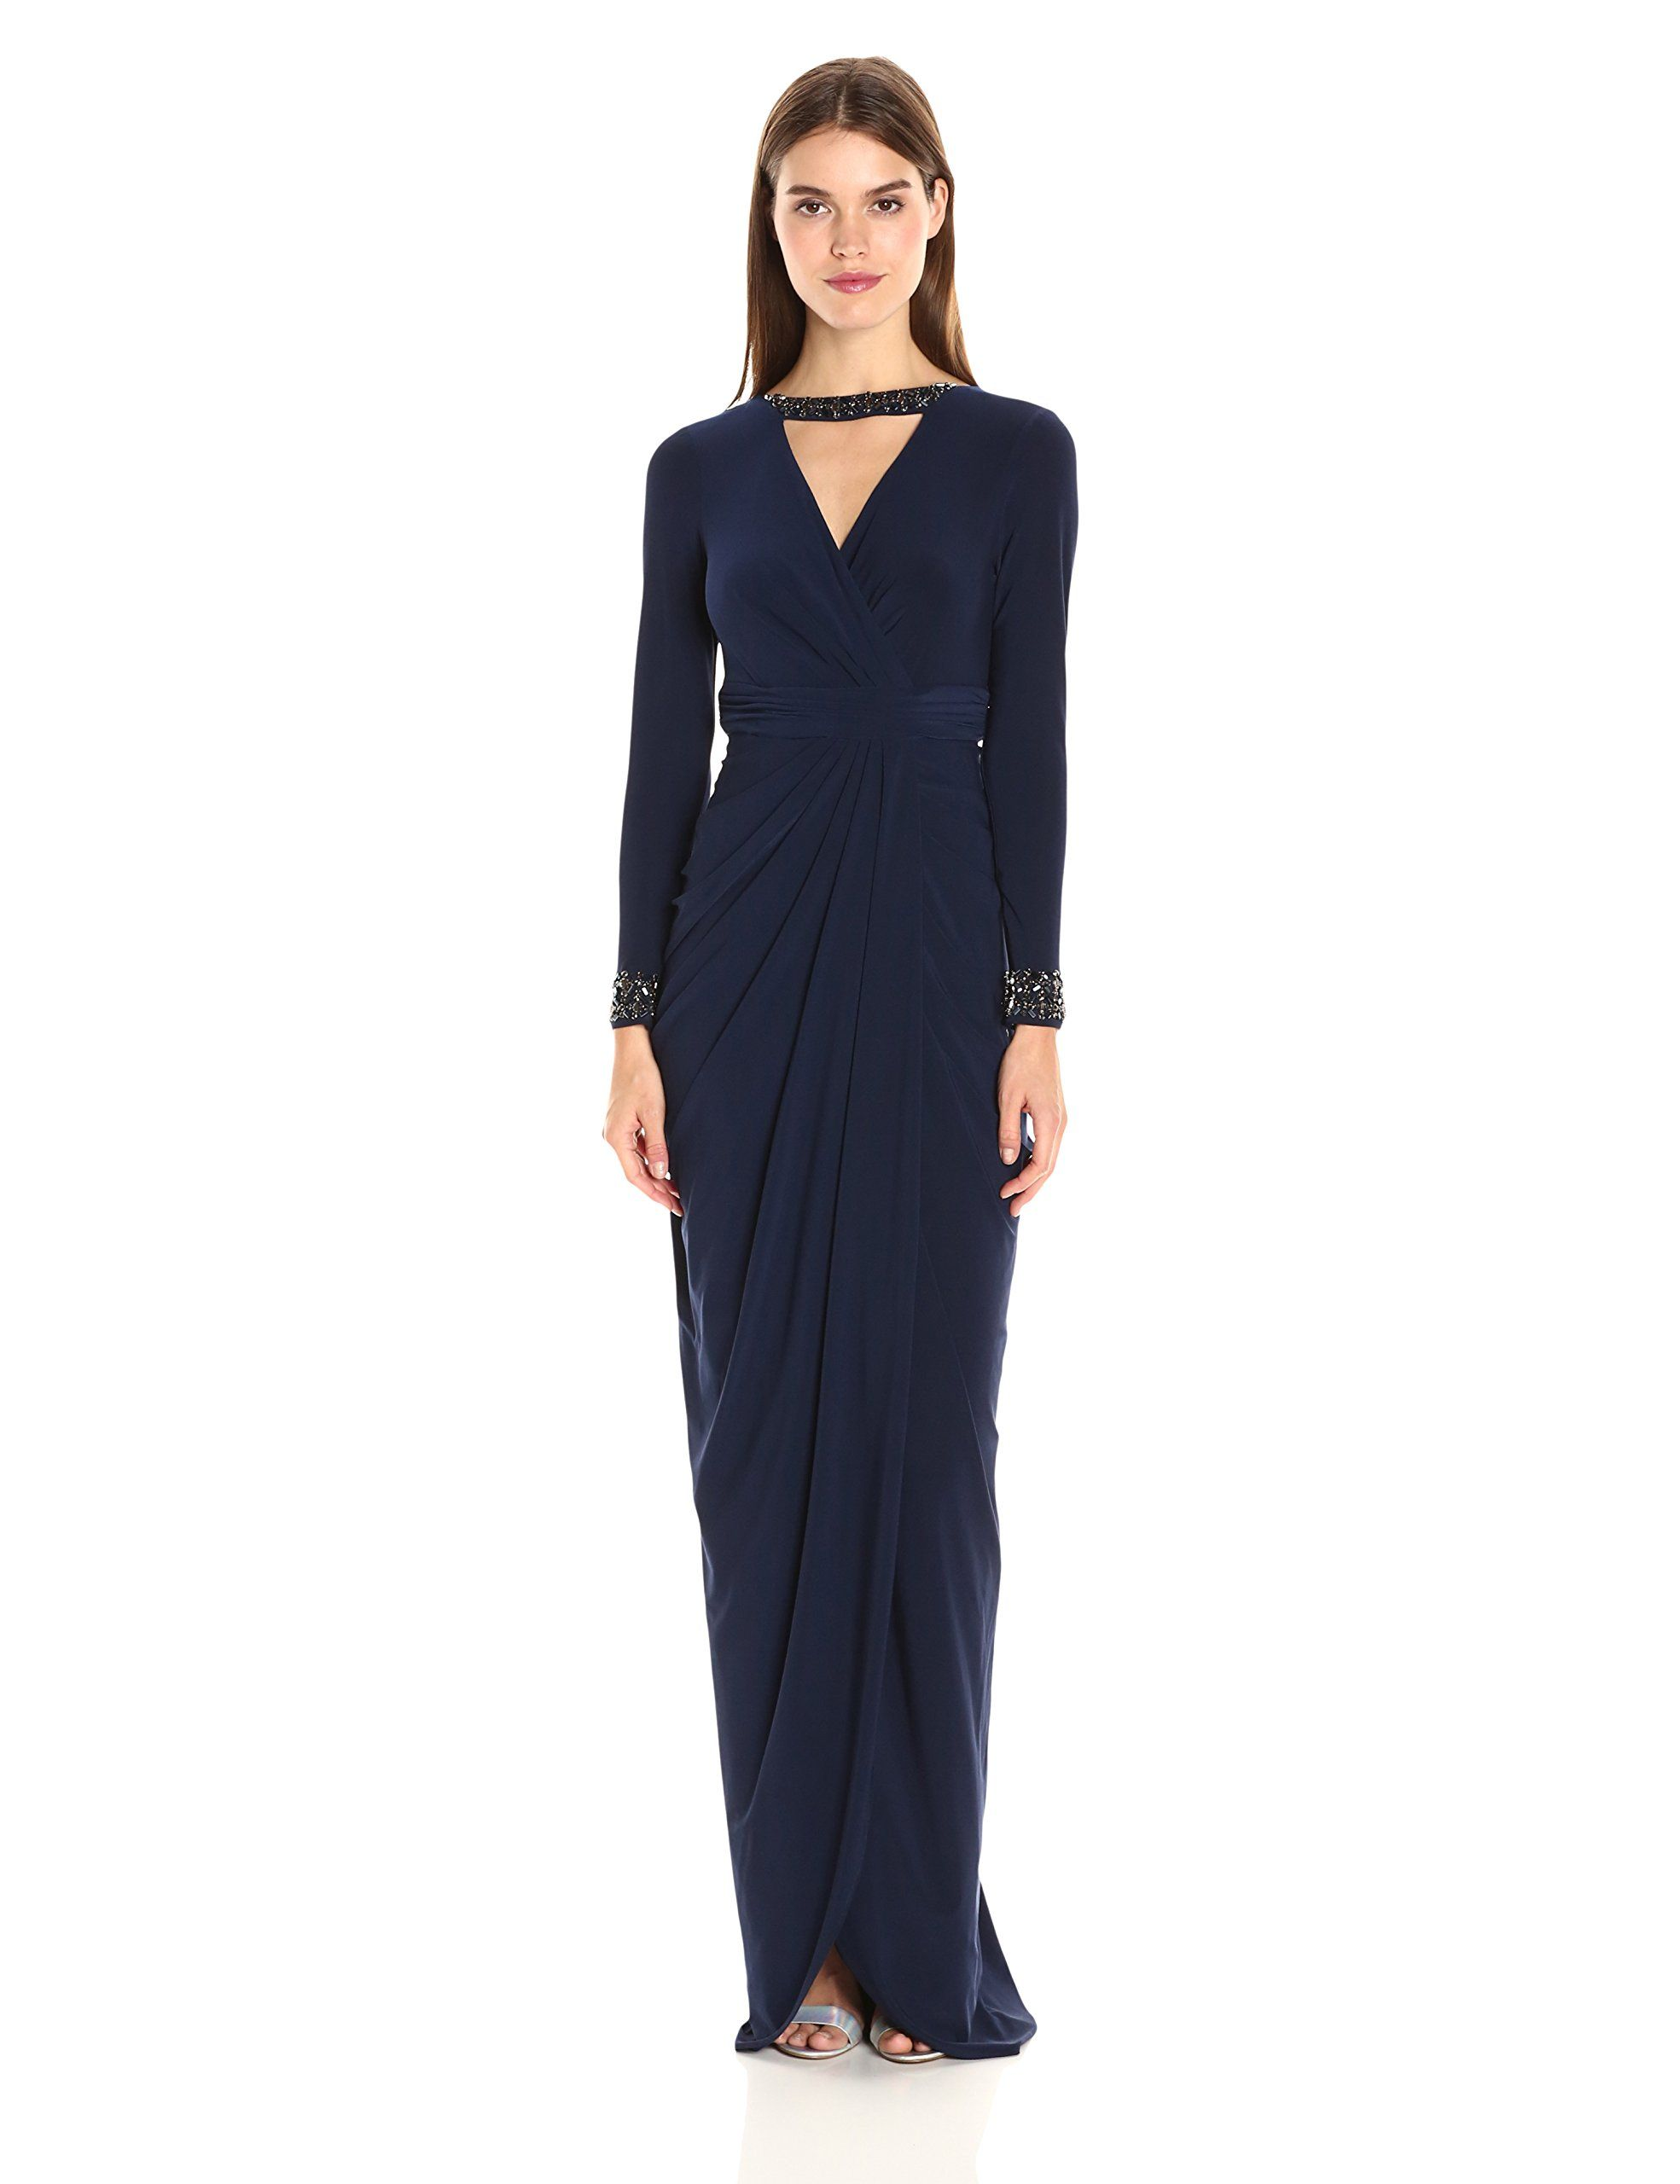 Macys - Adrianna Papell Elbow-Sleeve Contrast Lace Dress